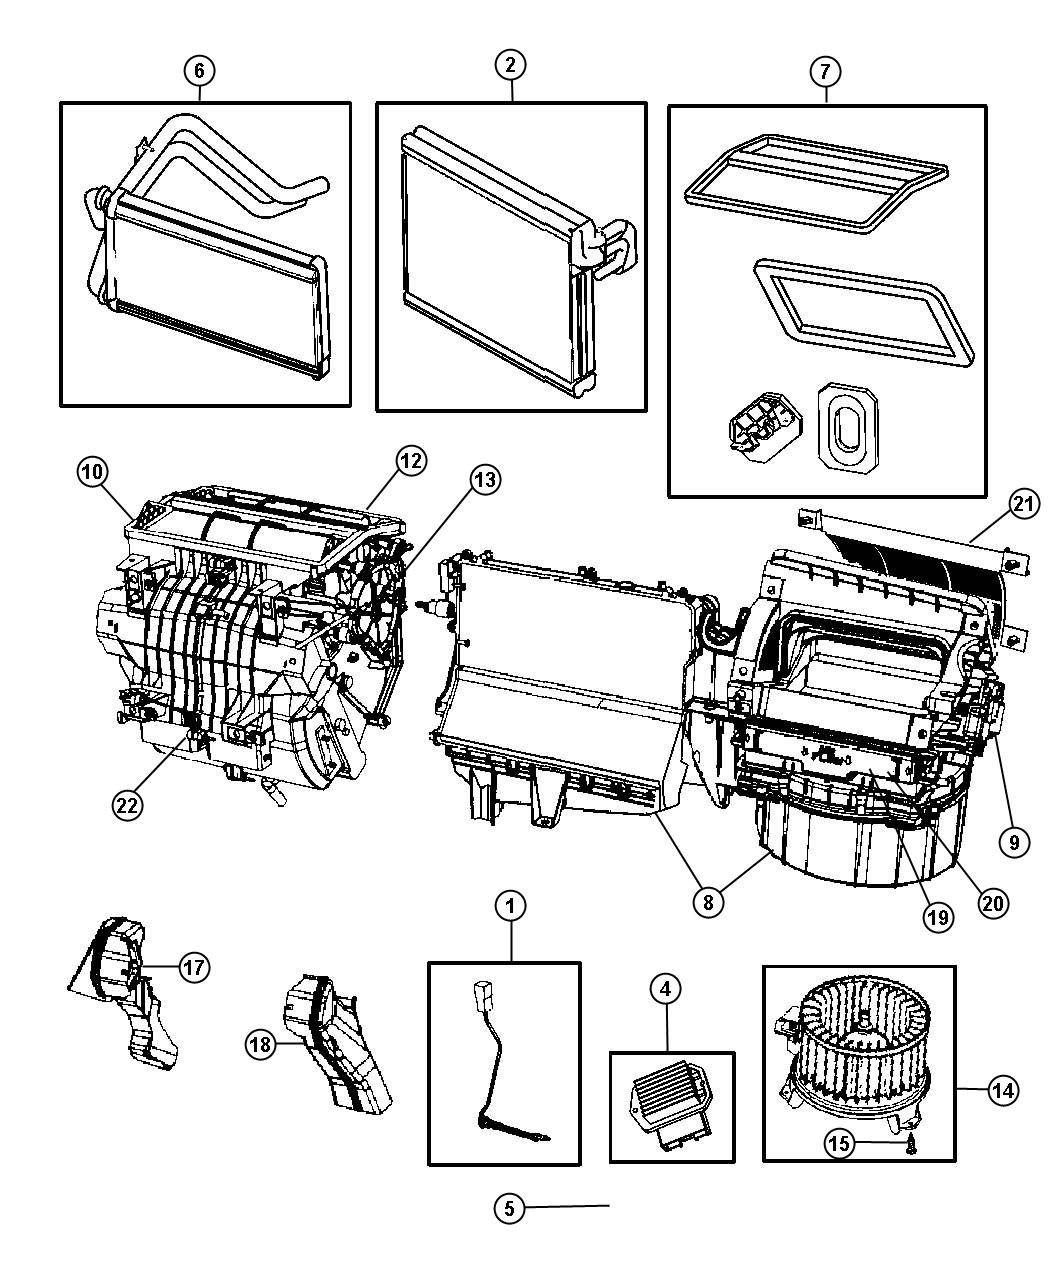 Jeep Patriot Evaporator. Air conditioning. Panel, module